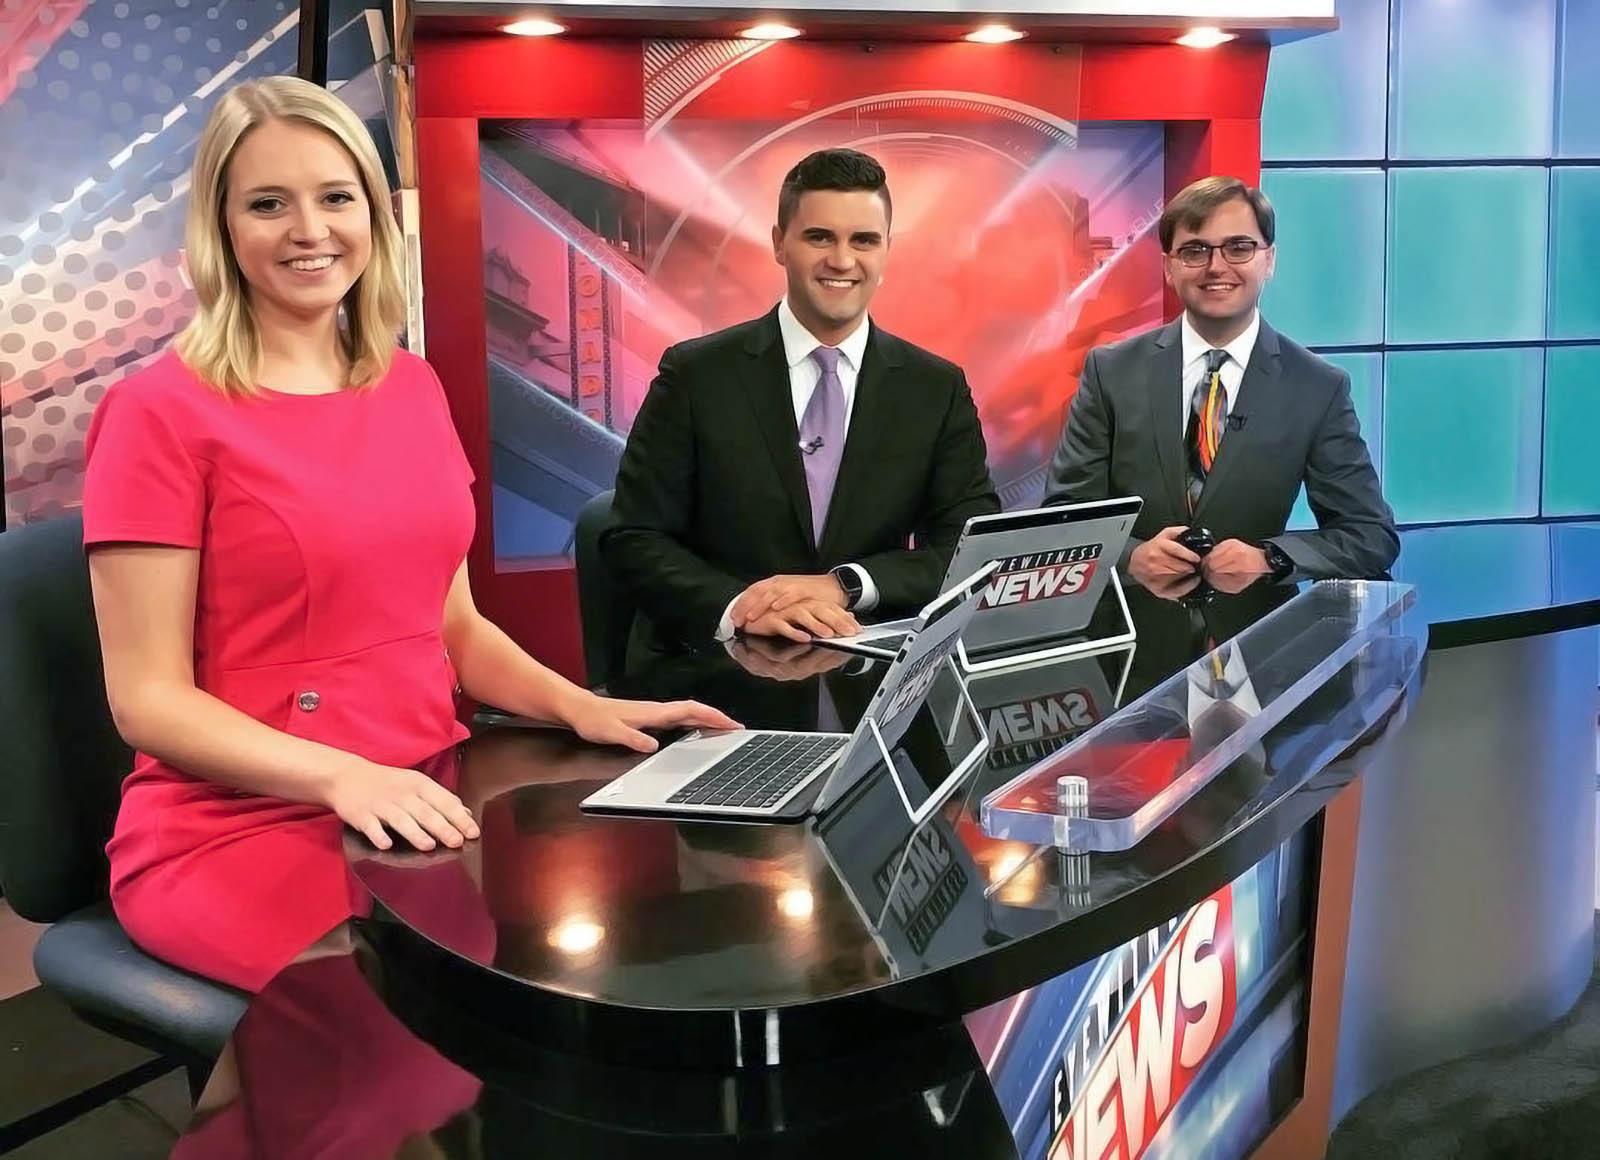 Fox 39 Newscasters at Onair Studio